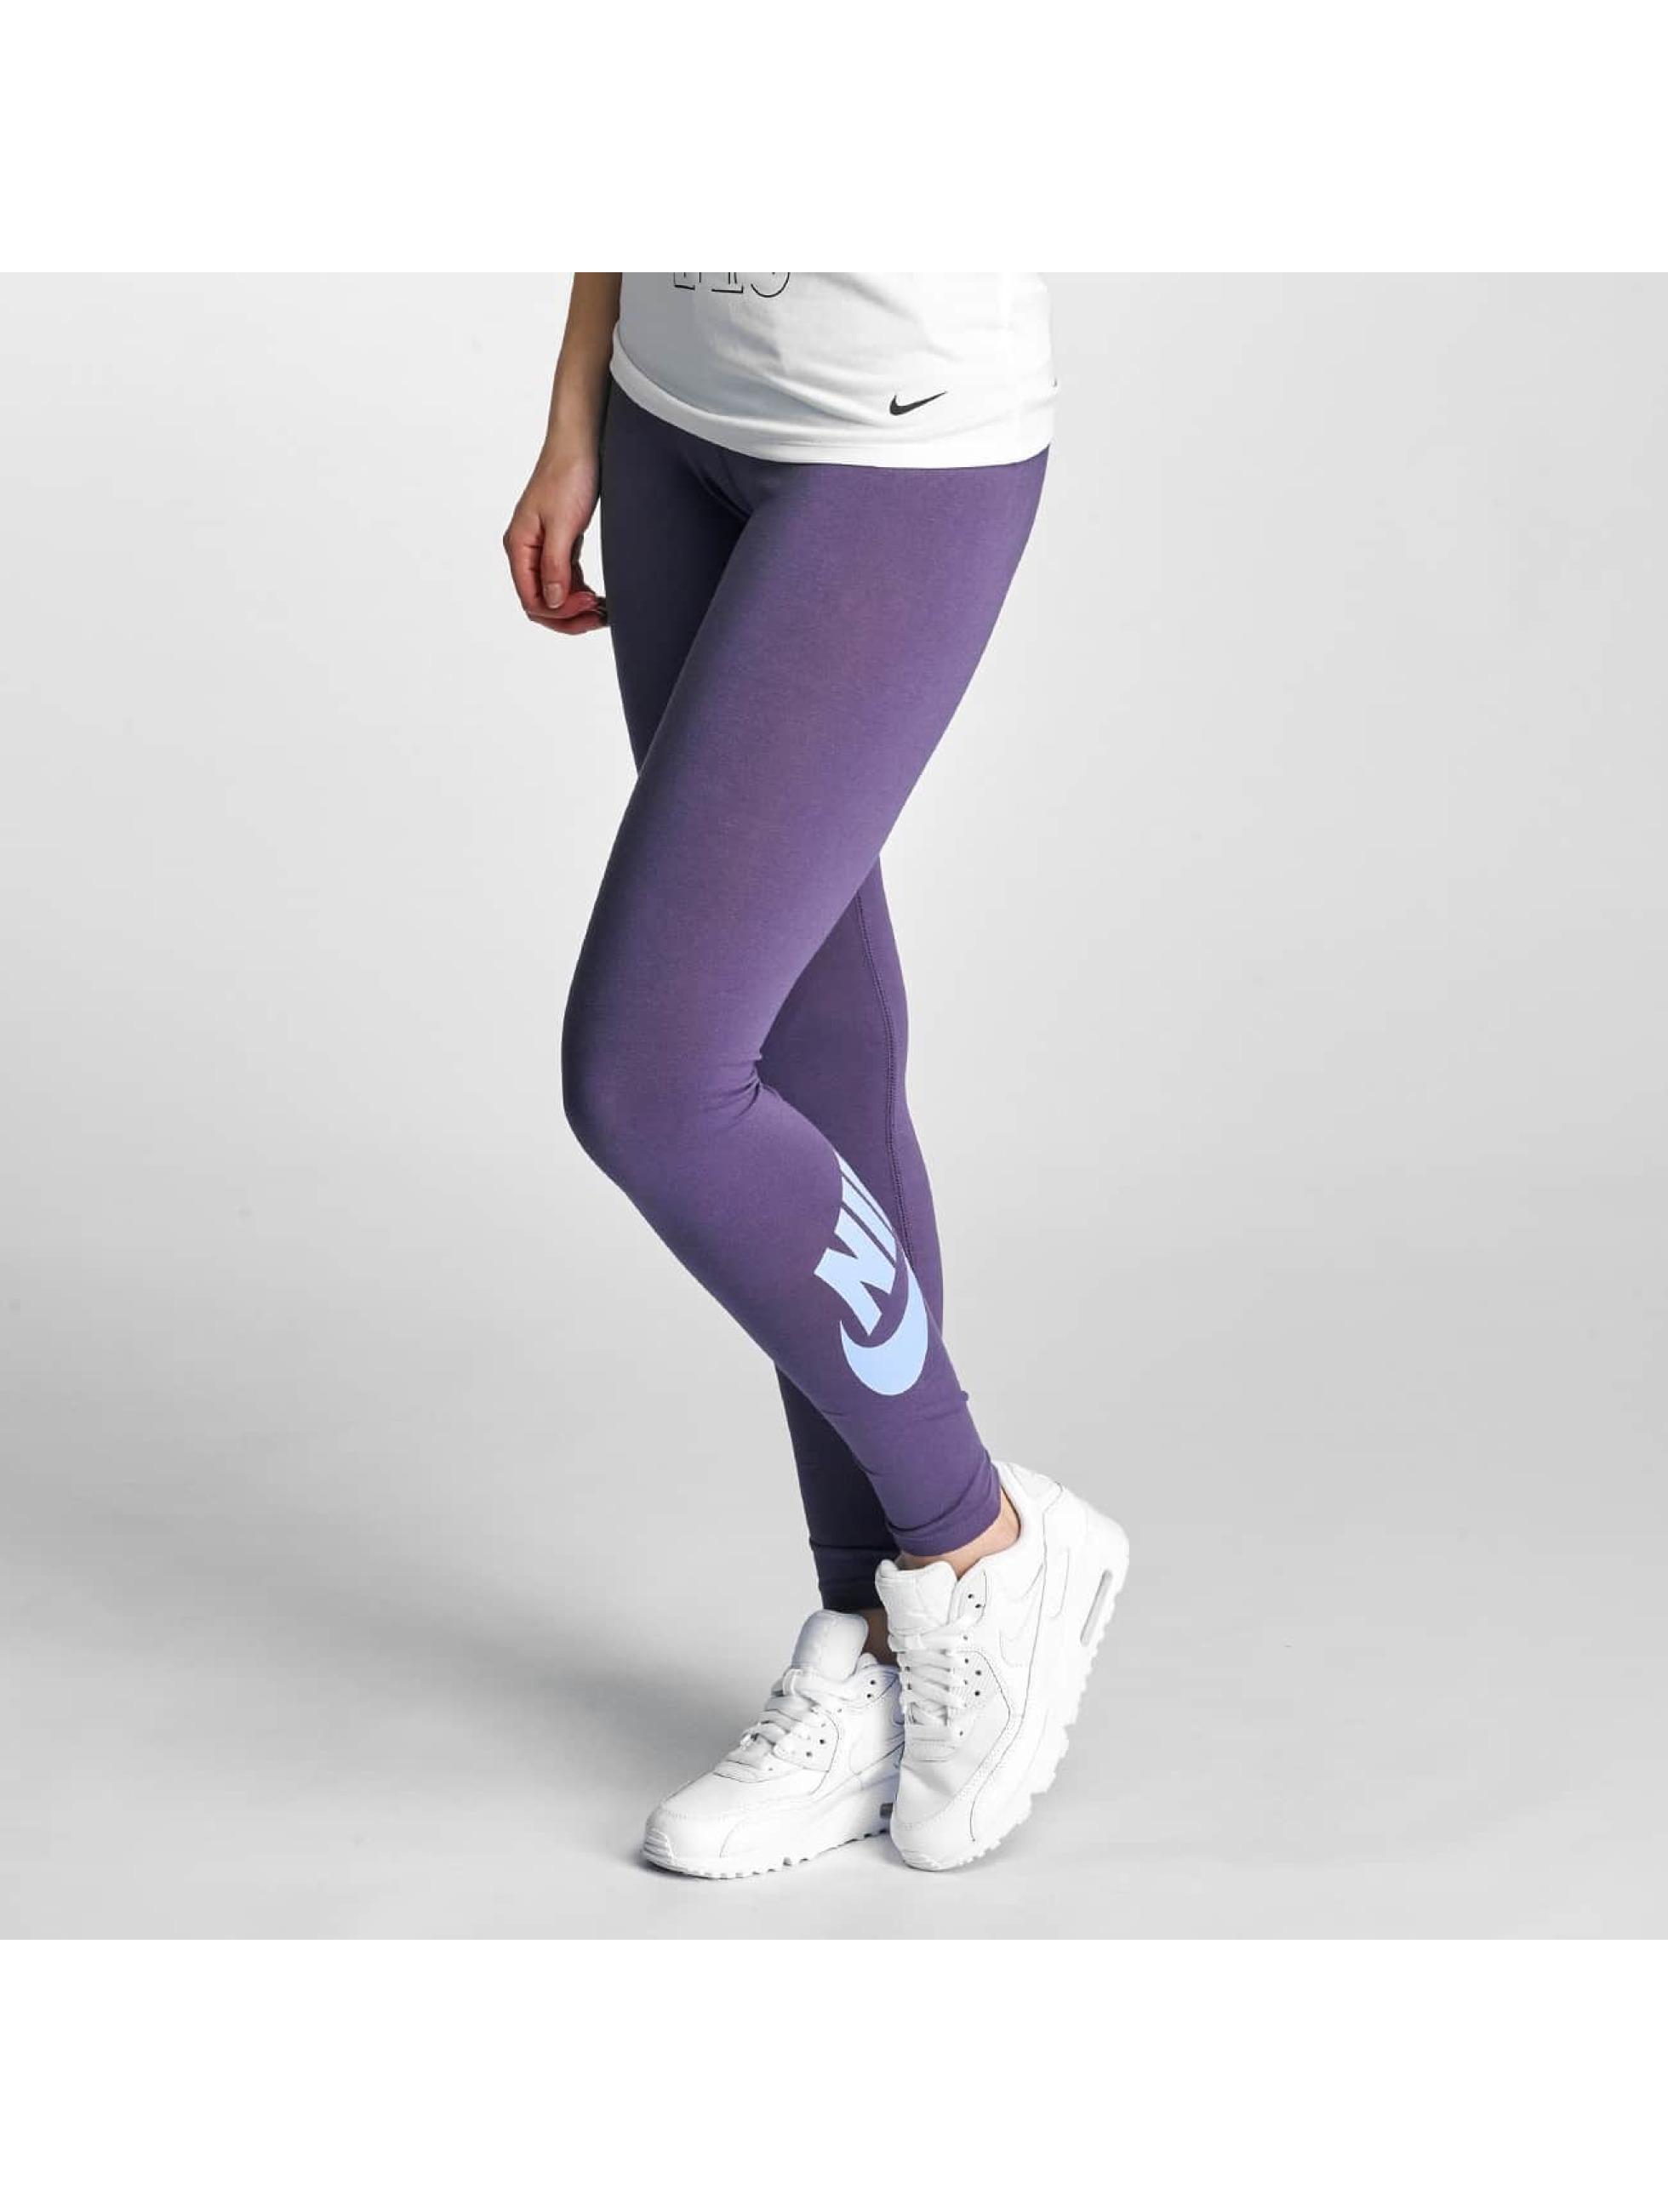 Nike Frauen Legging Leg-A-See in violet